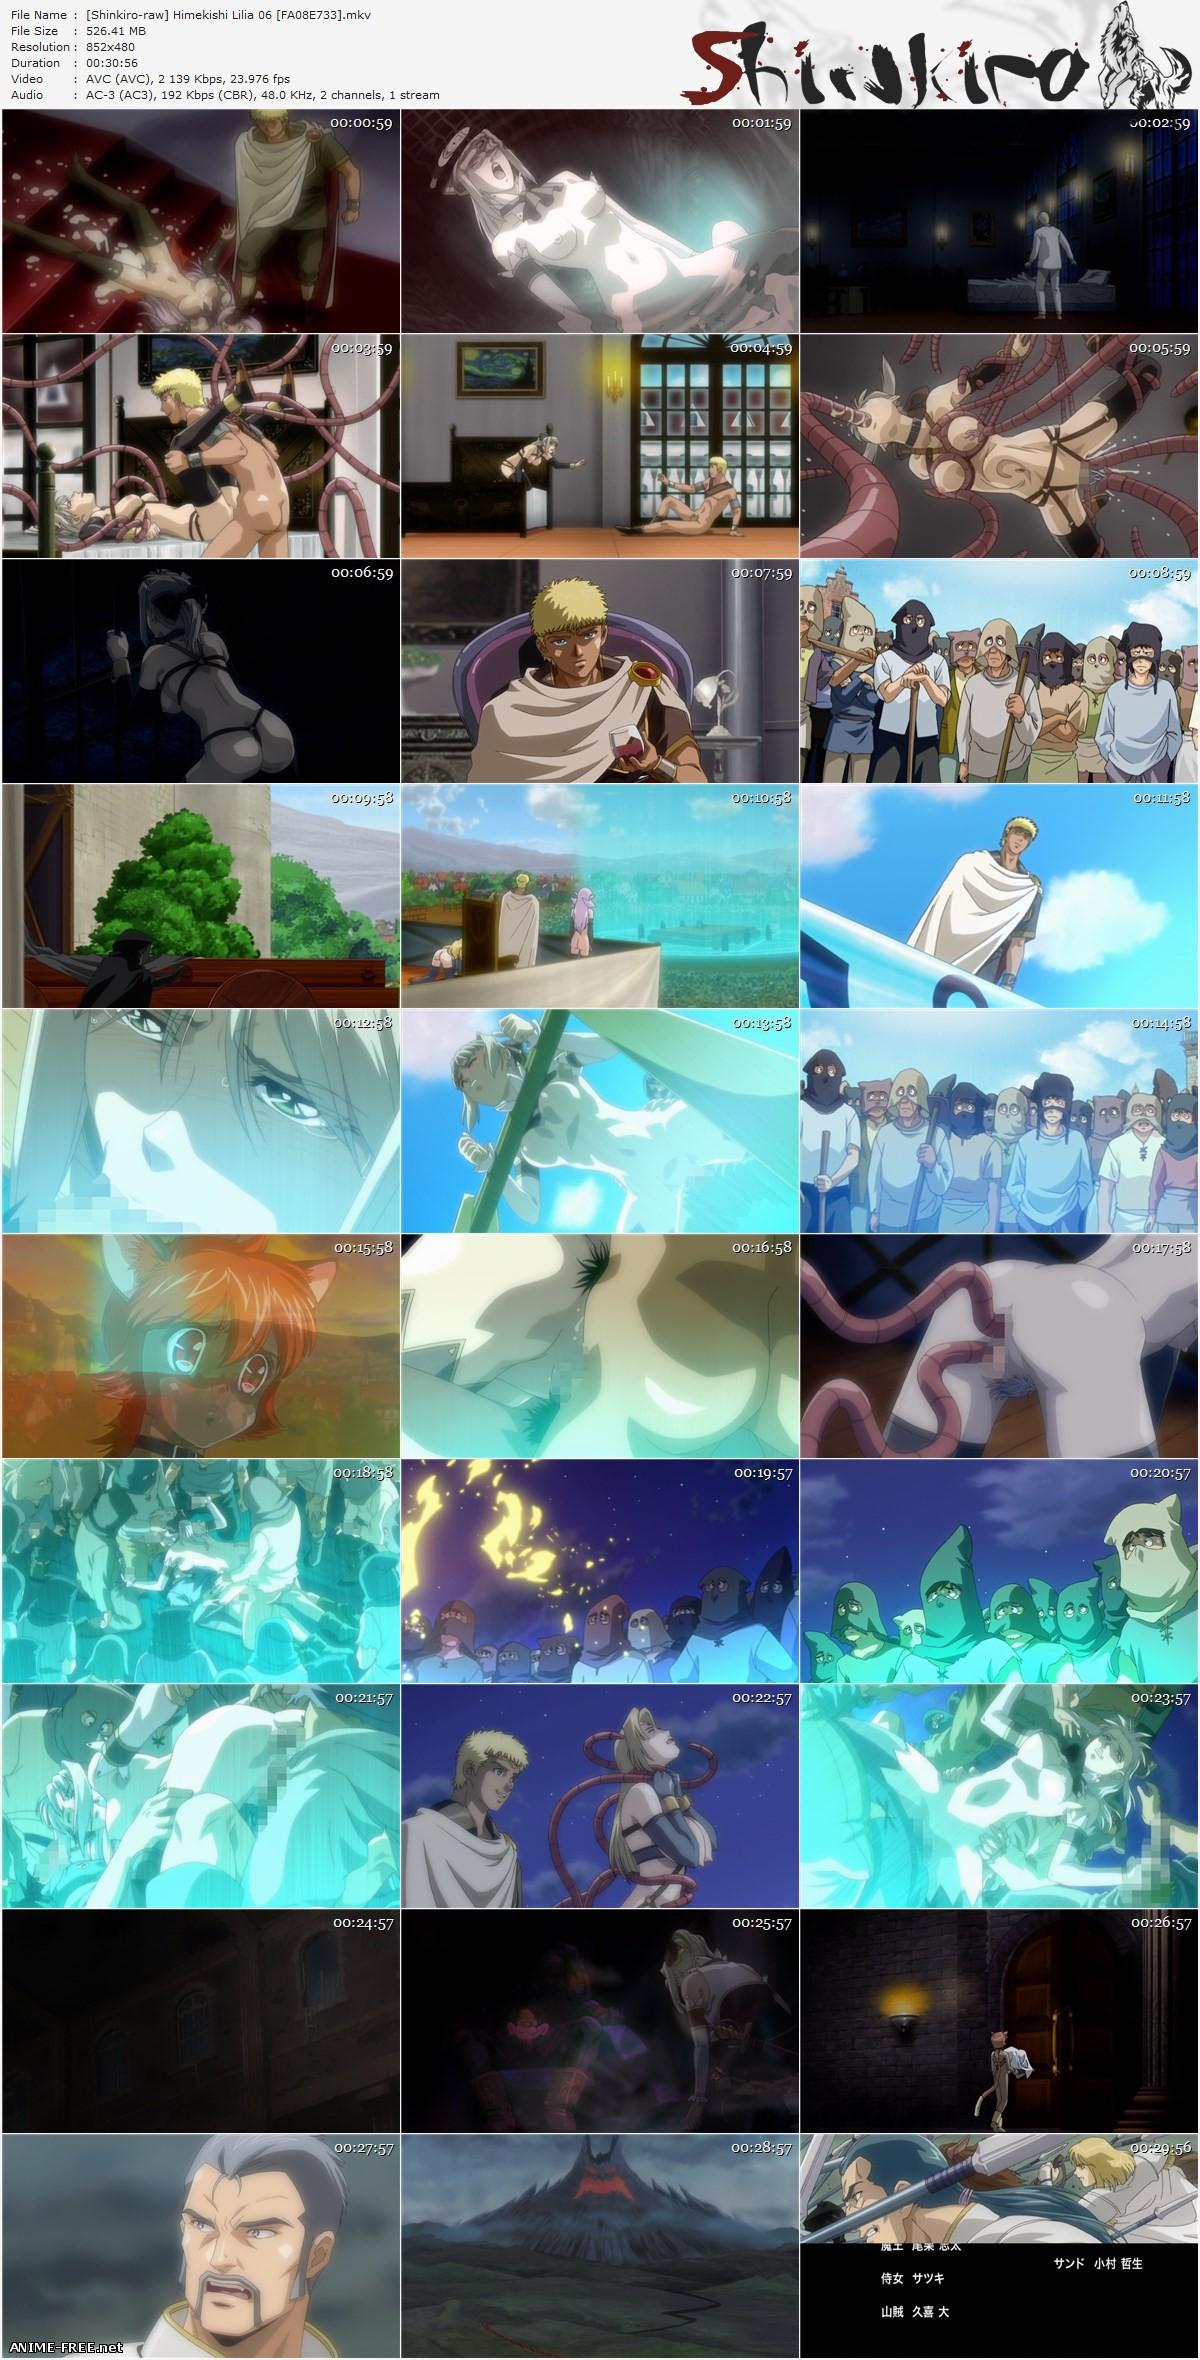 Лилия, леди-рыцарь / Himekishi Lilia [6 из 6] [JPN,ENG,RUS] Anime Hentai